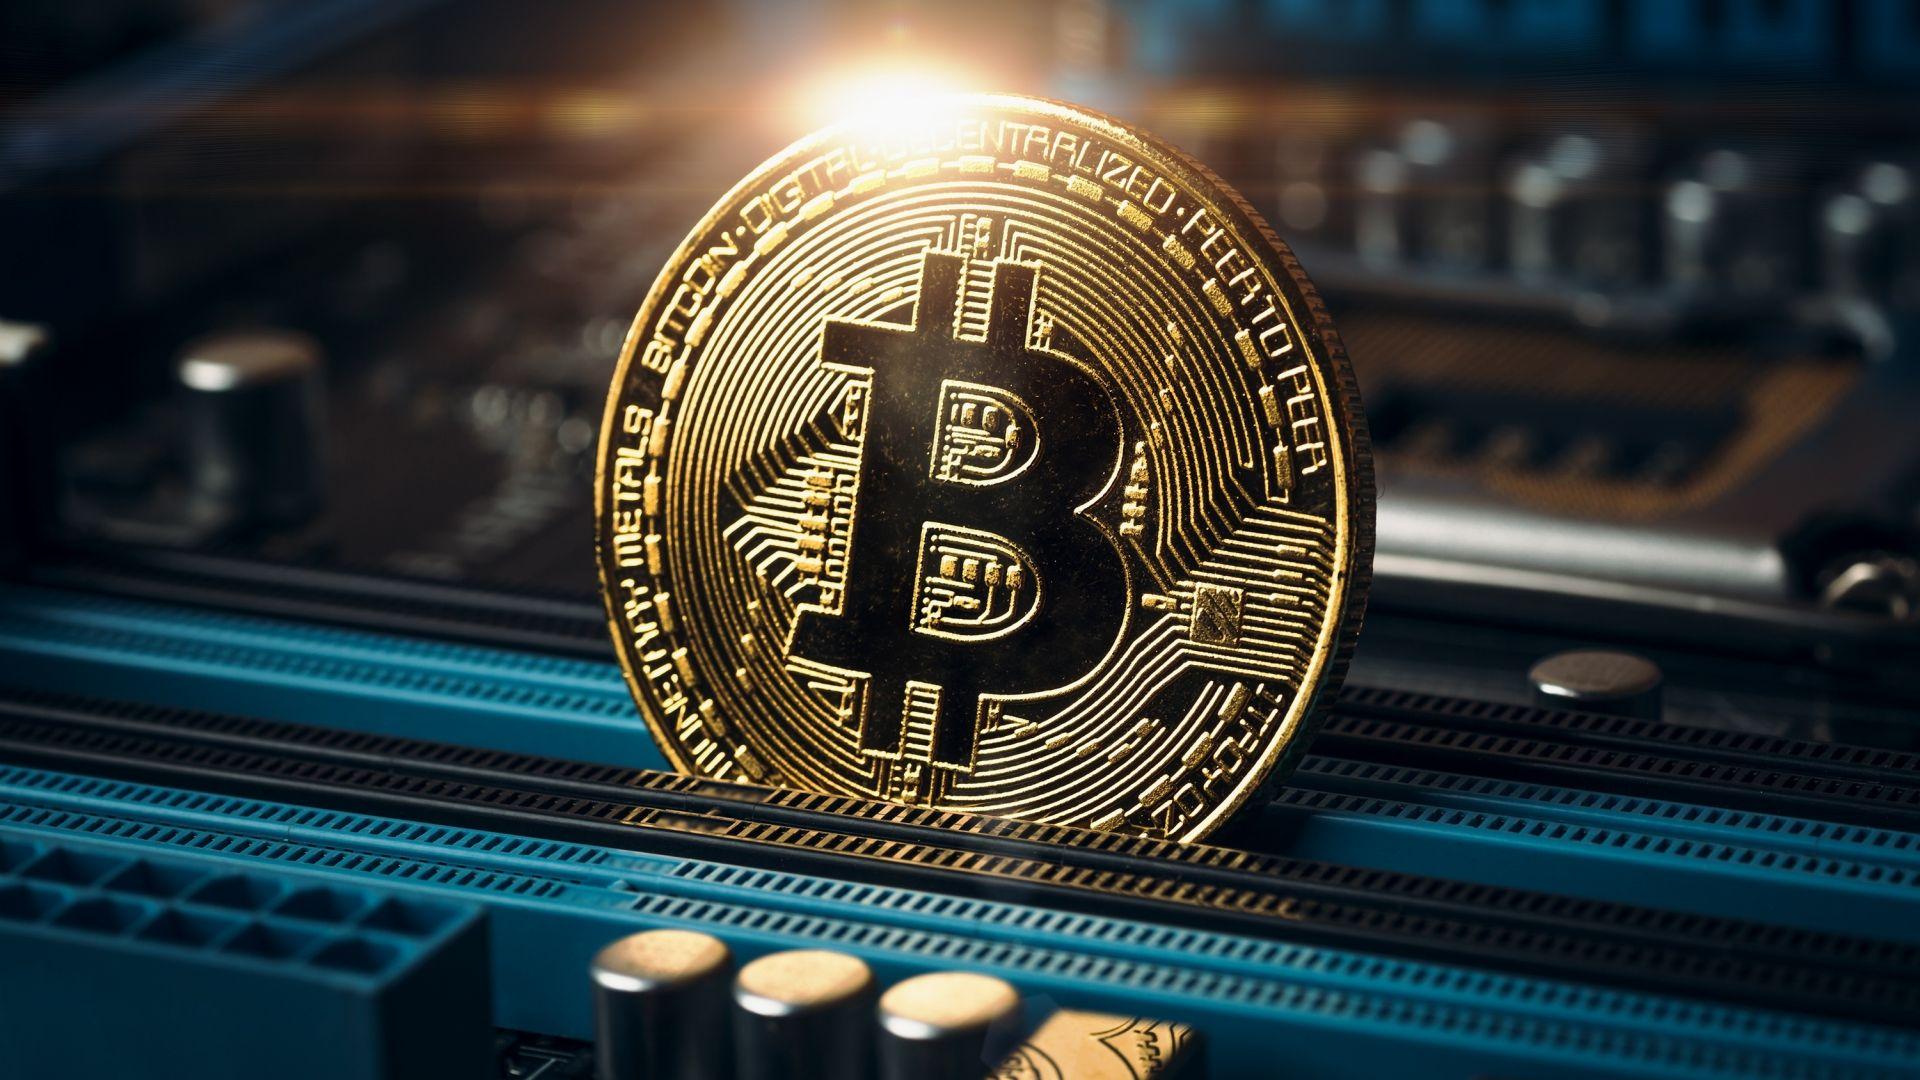 Desktop wallpaper coin money bitcoin hd image picture 1920x1080